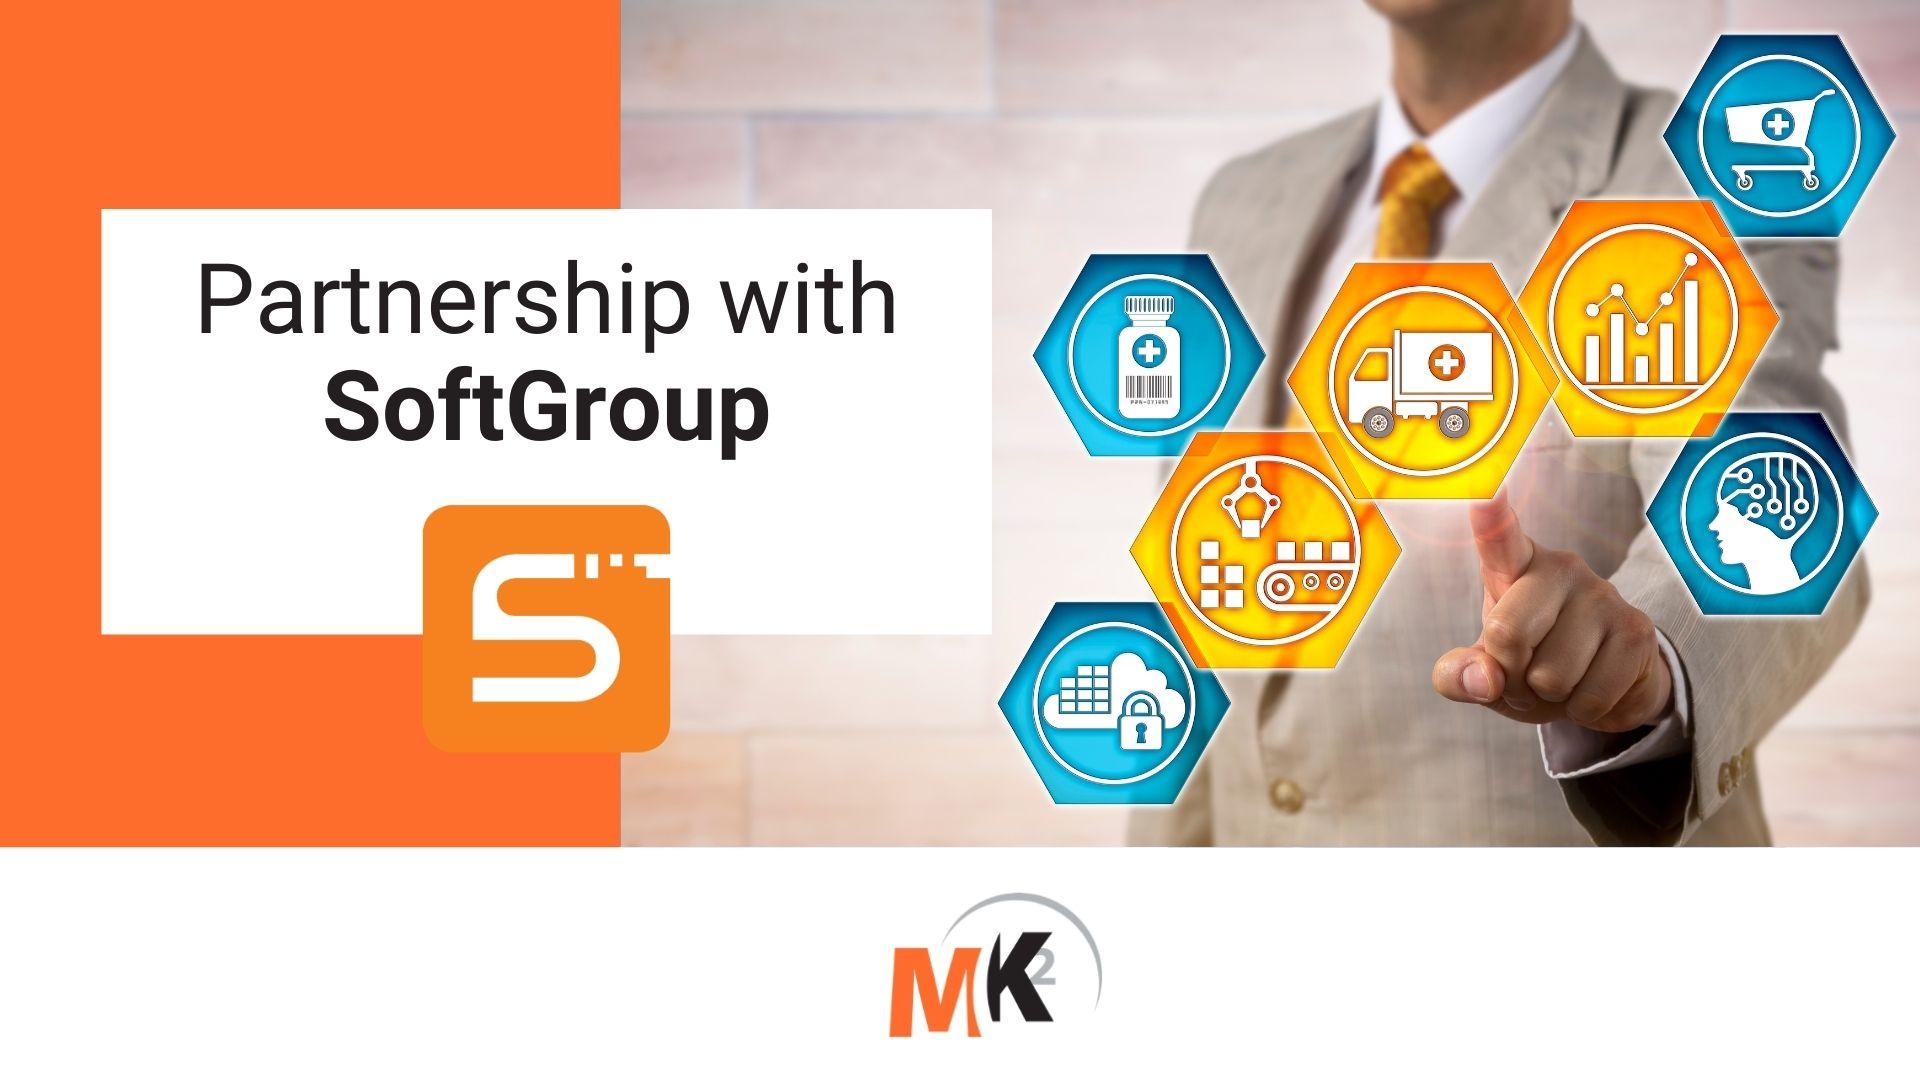 MK² Partnership with SoftGroup